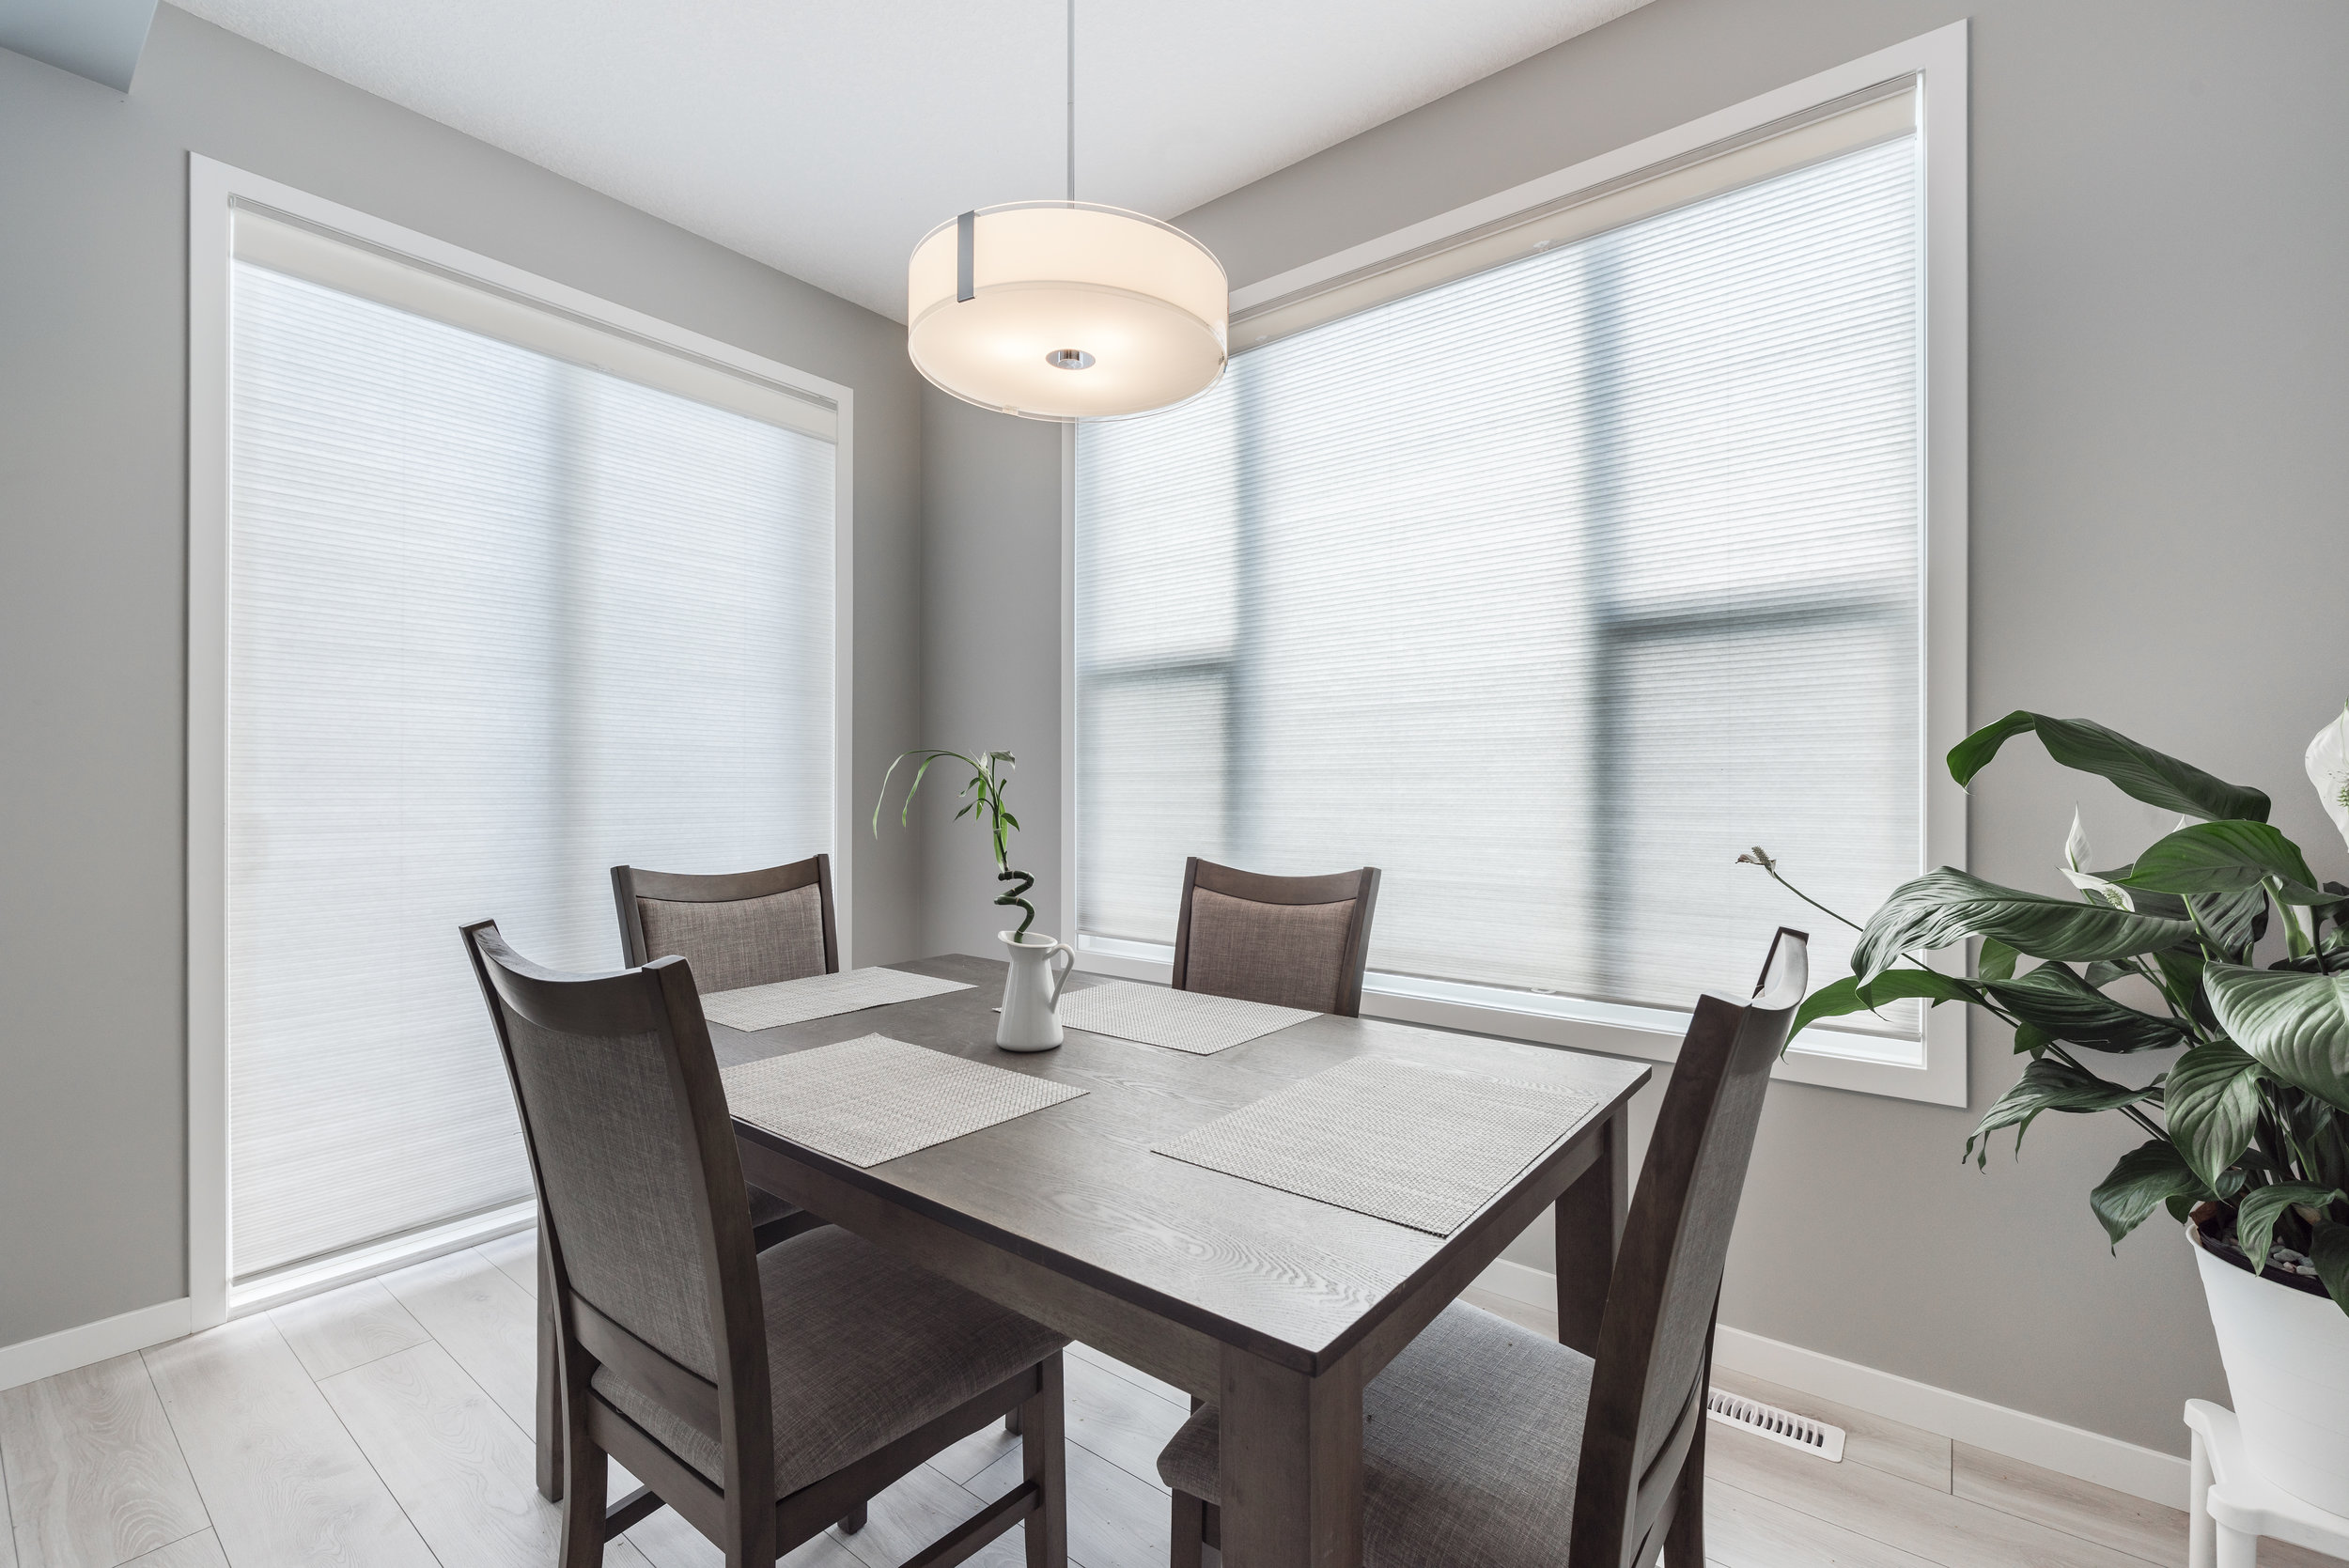 calgary honeycomb shades - kitchen blinds